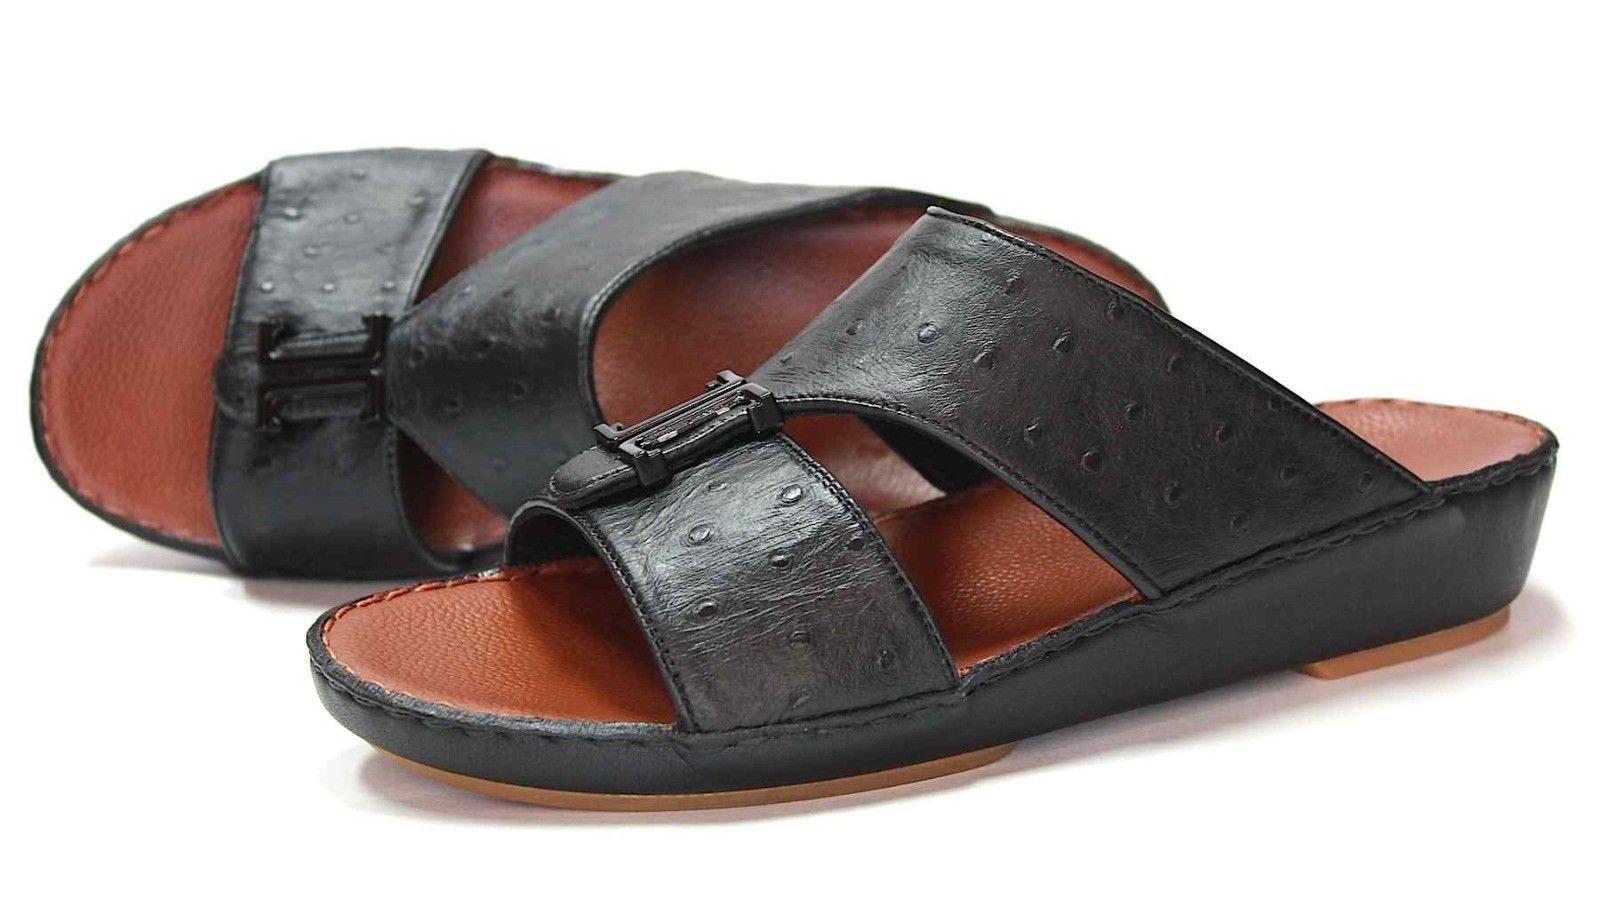 cc73ac10c2c0 Mens Shoes 45054  Arab - Muslim - Arabic Slipper